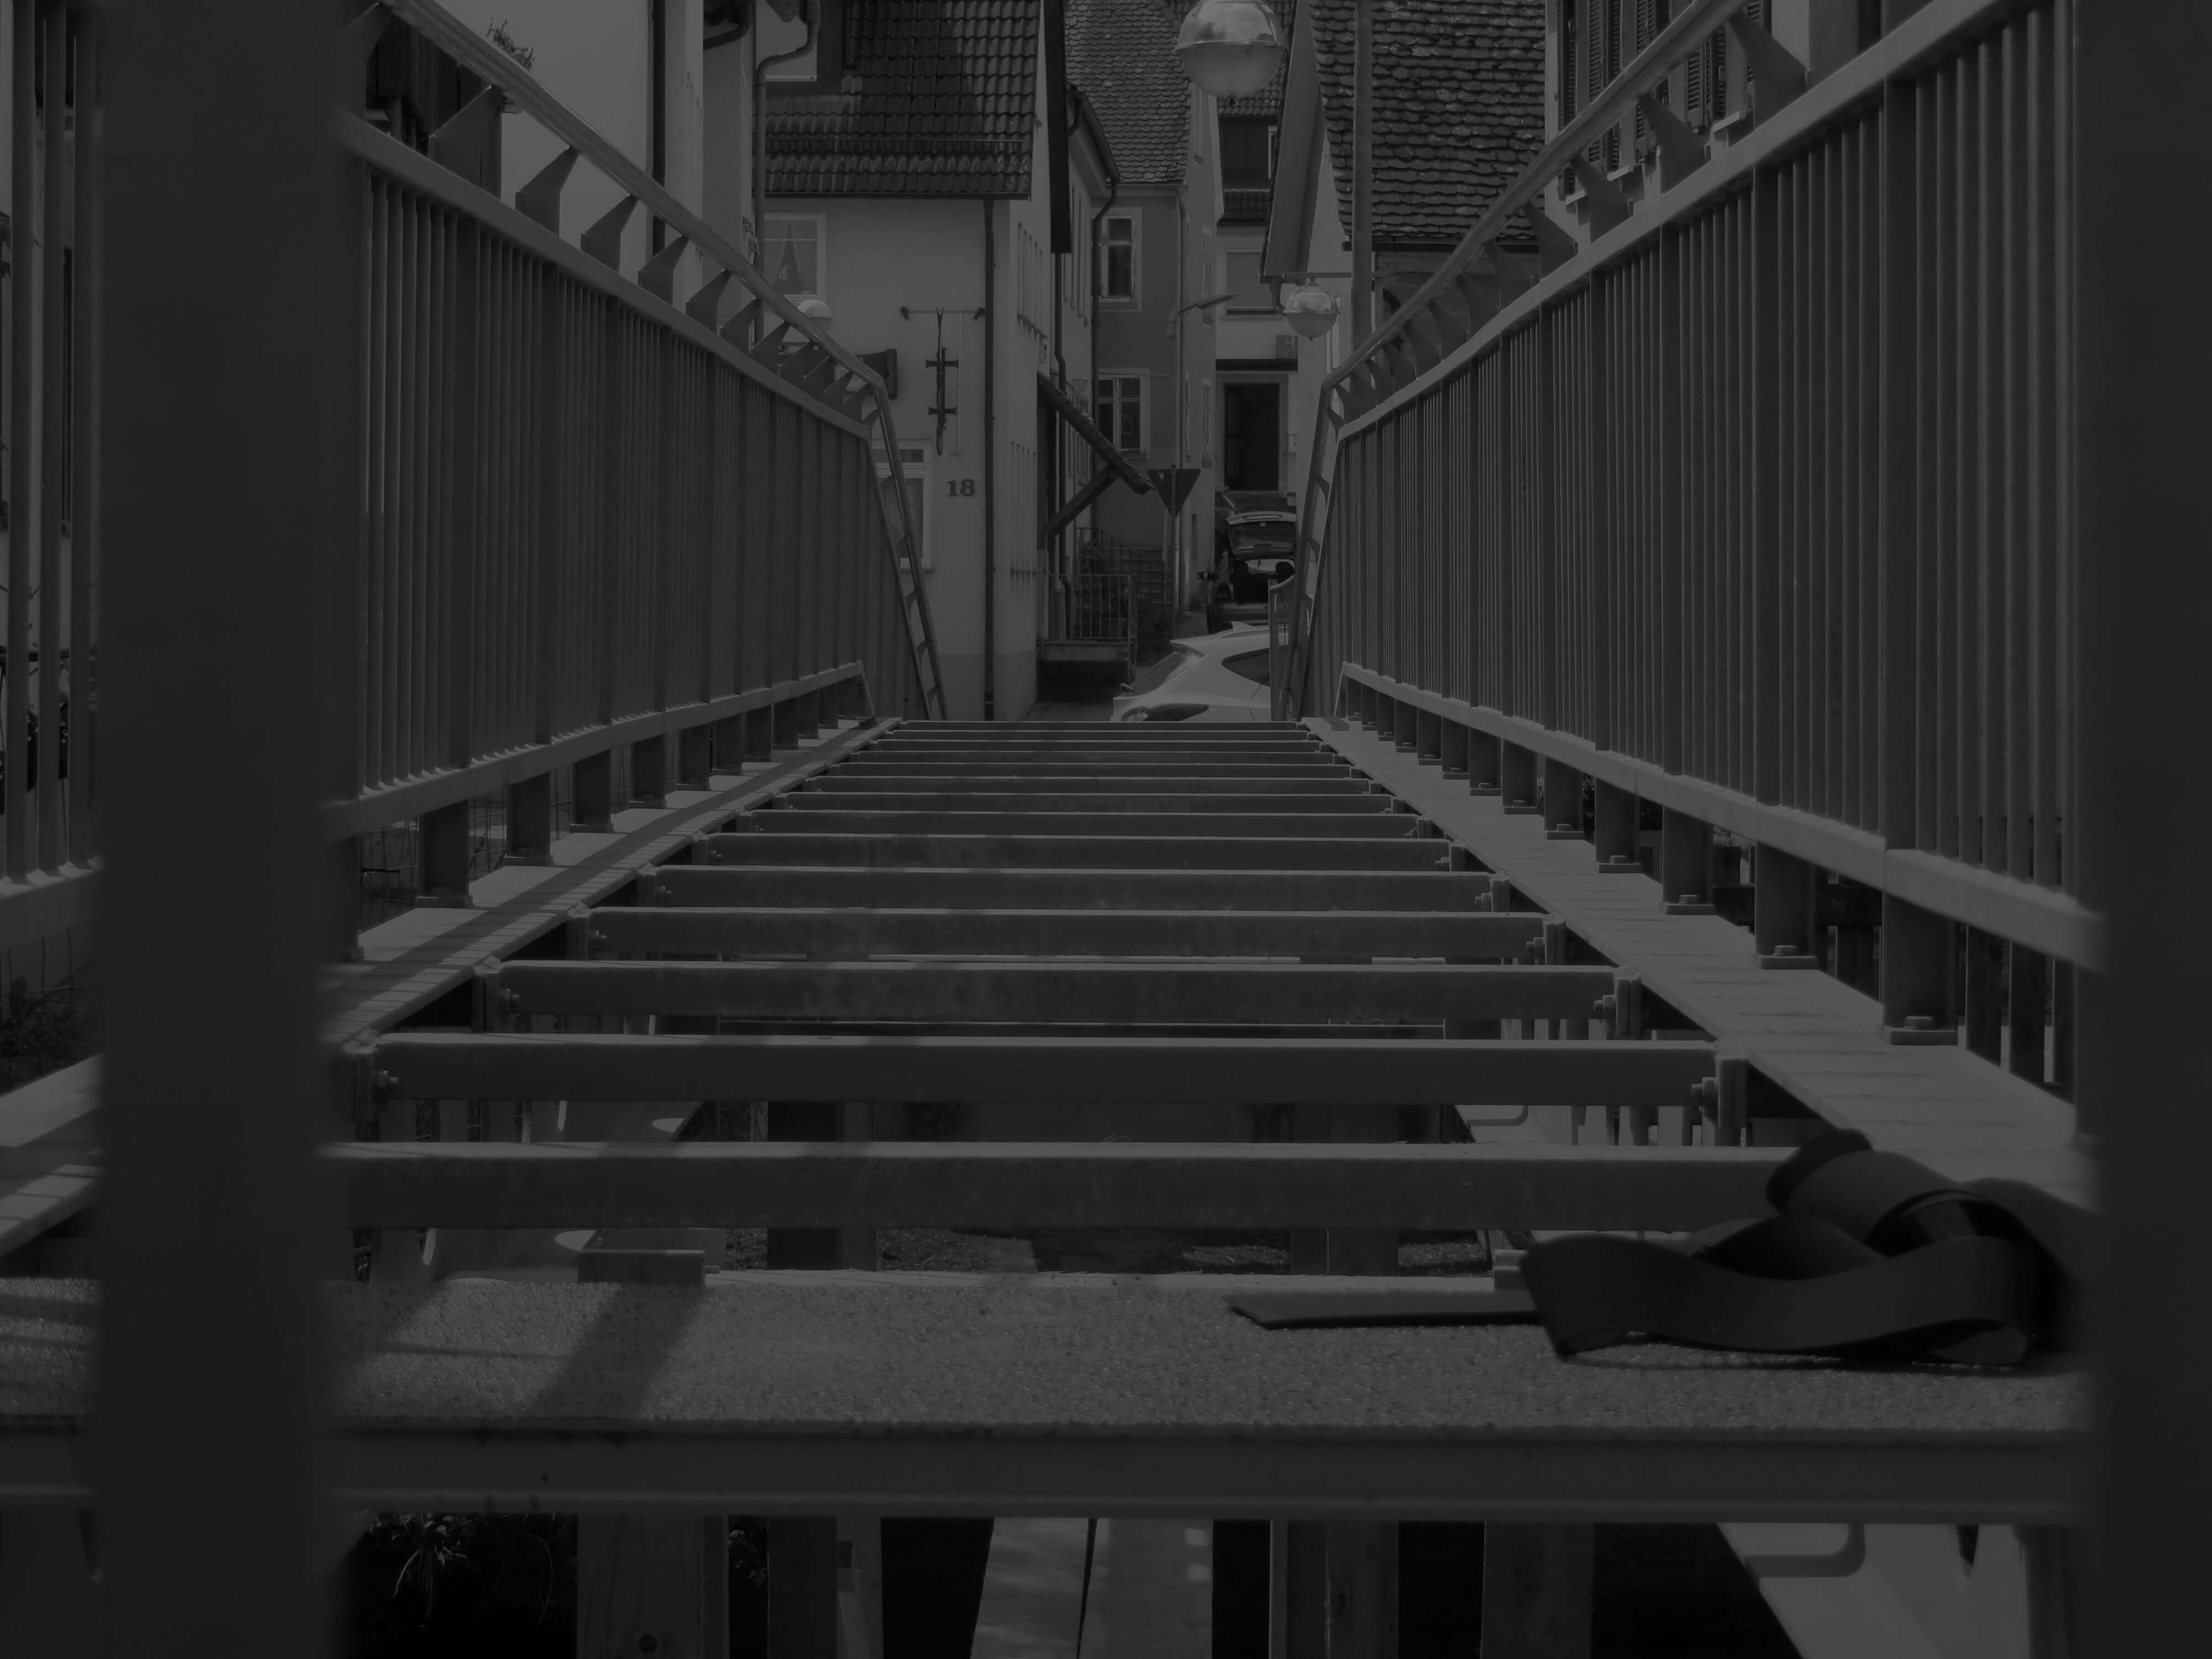 krafton-GFK-Brückenbeläge-Montagemethoden